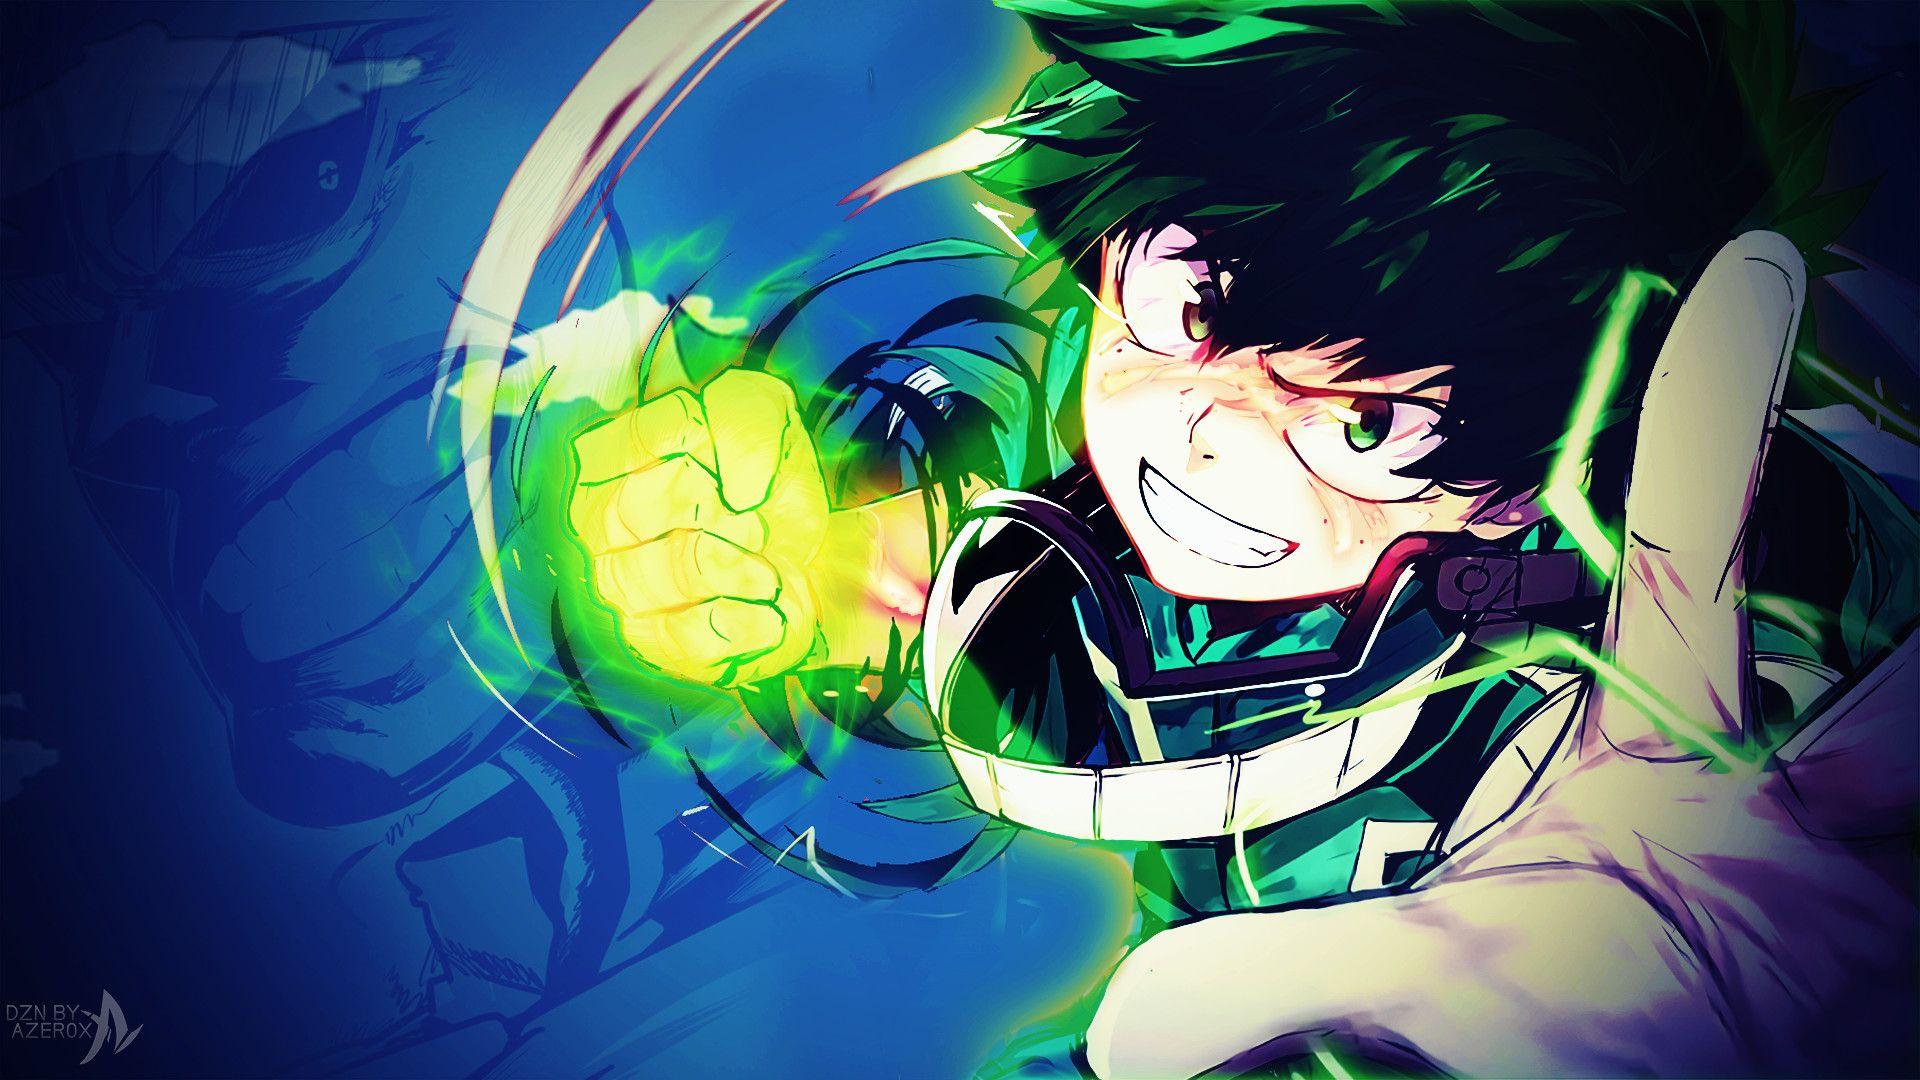 Izuku Midoriya Green Hair Angry Anime Boy Wallpaper Hero Wallpaper Anime Boy Anime Wallpaper